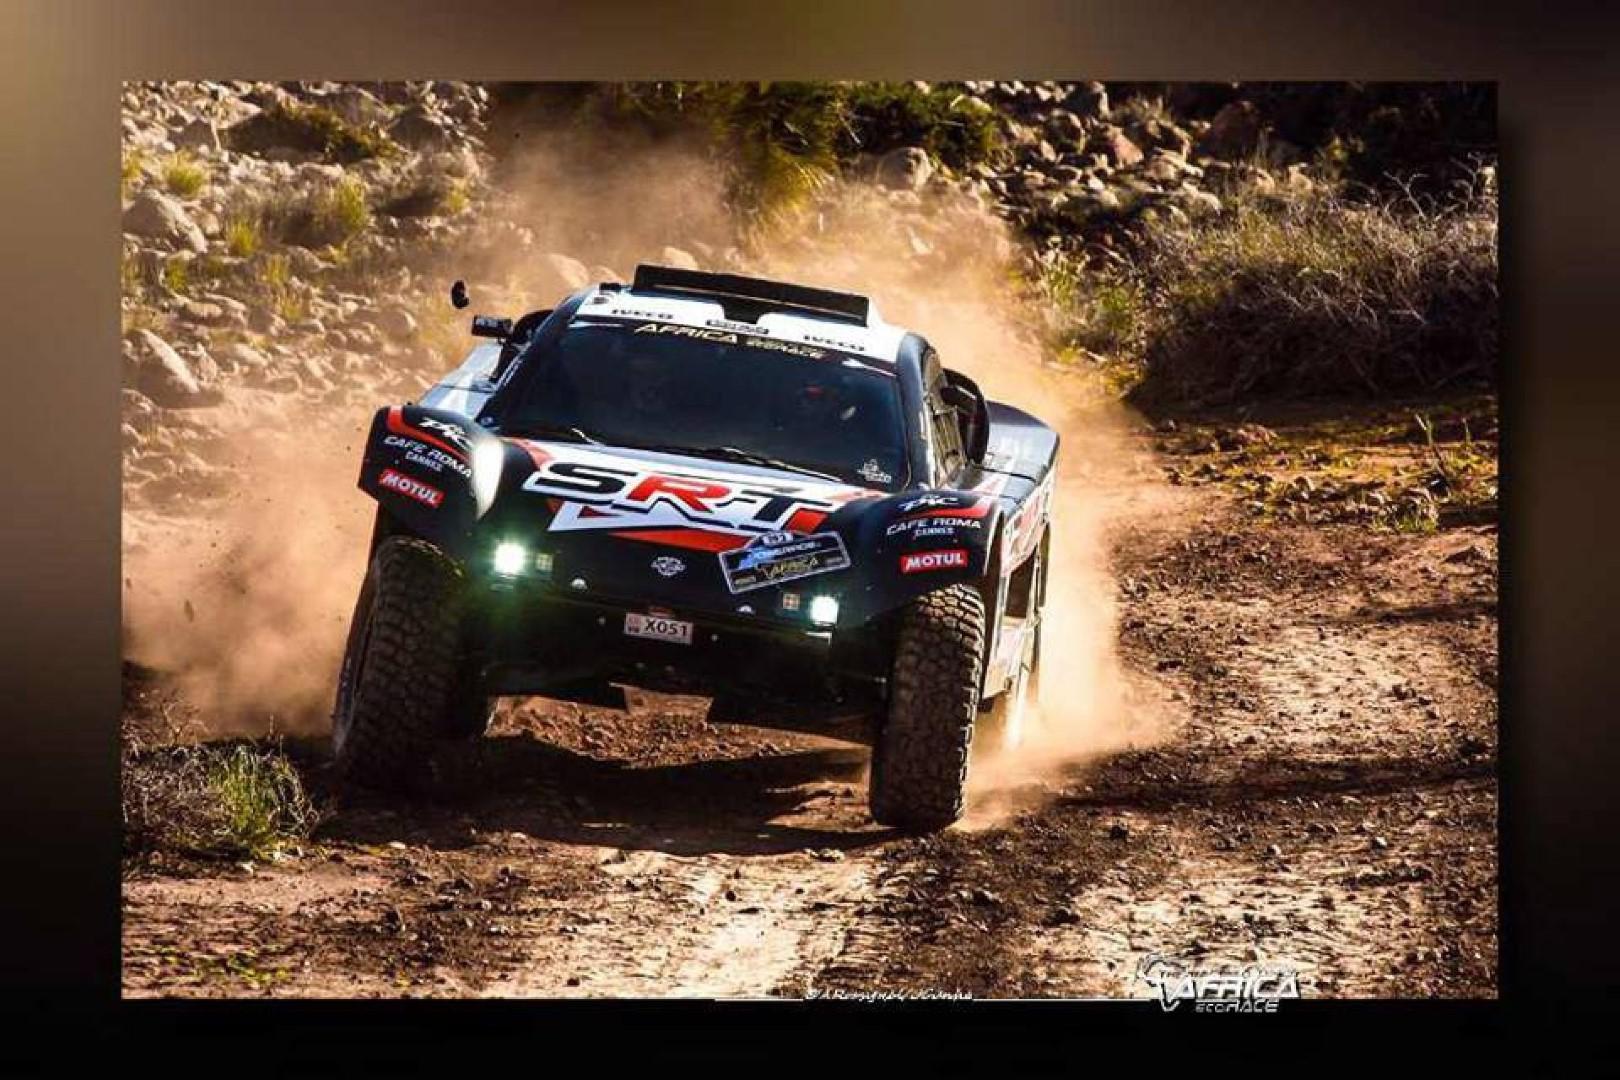 Serradori Racing Team dévoile son calendrier des compétitions : La baja Aragon, le rallye Oilibya du Maroc et l'Africa Eco Race.